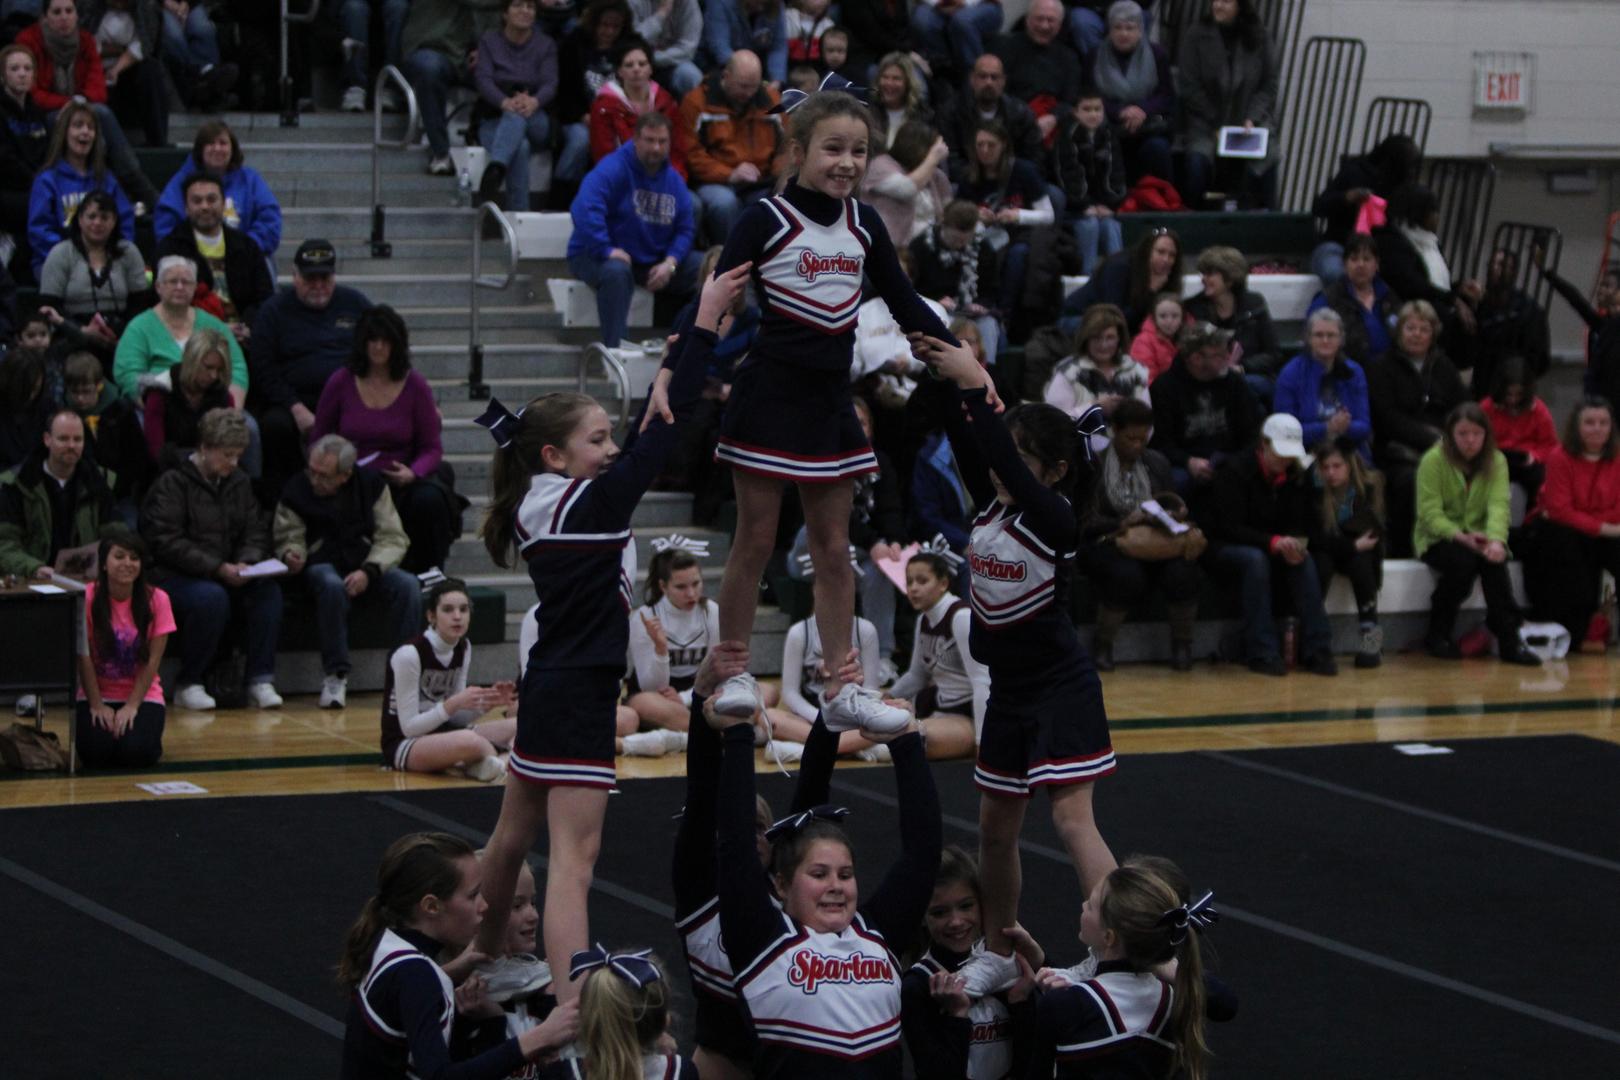 junior gladiators cheerleading